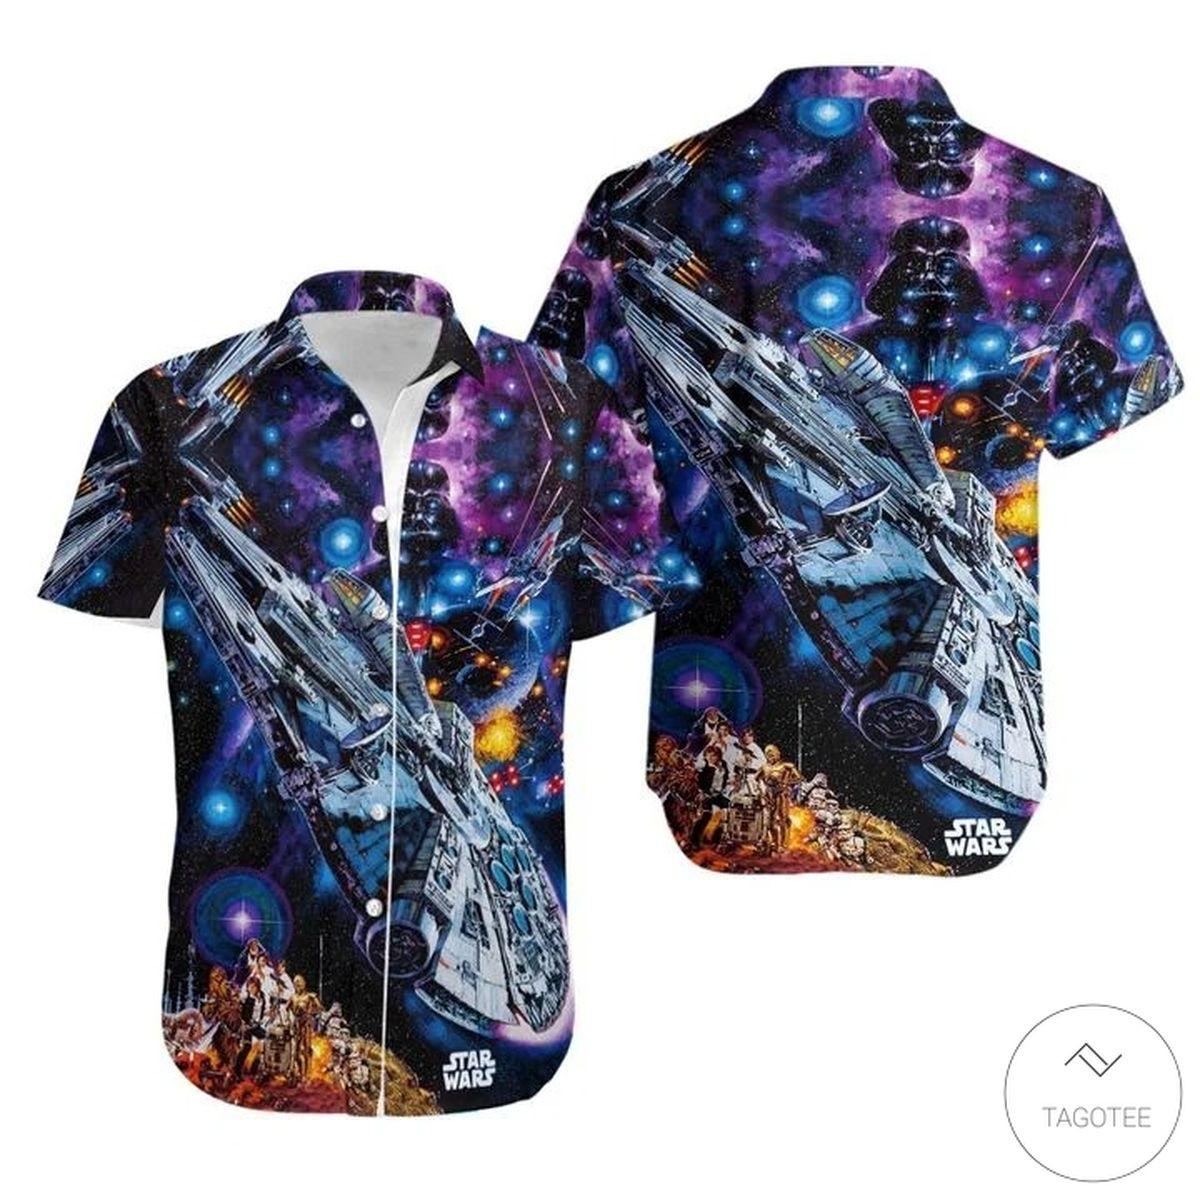 Star Wars The Mandalorian Starship Hawaiian Shirt